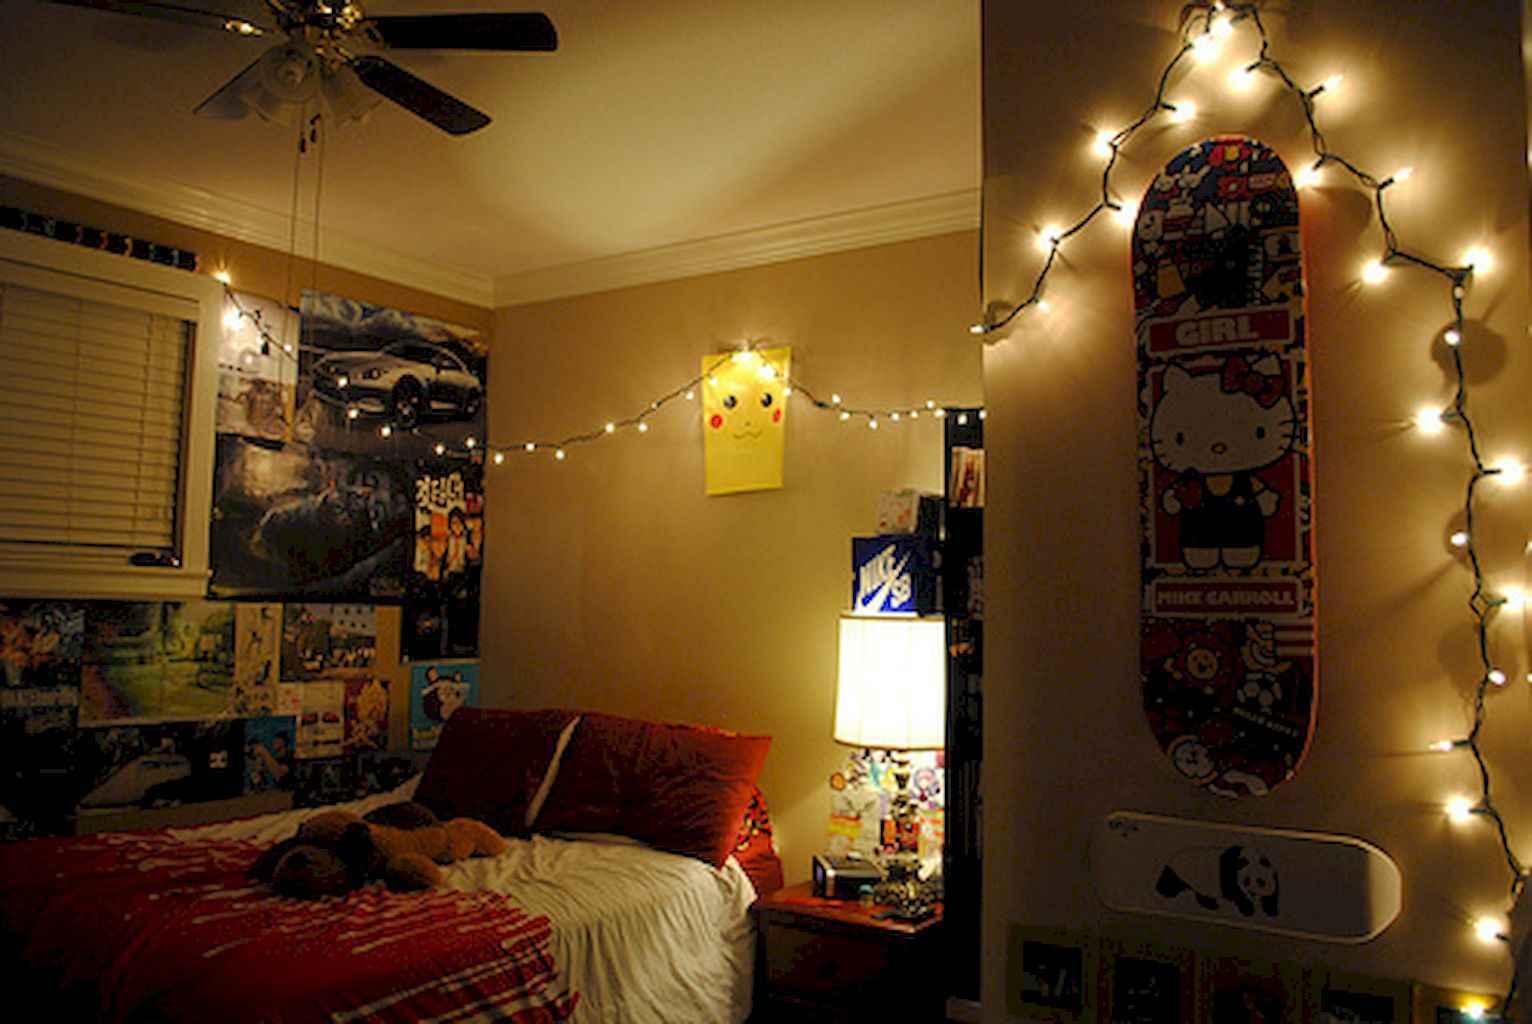 30 Diy Apartment Decorating Christmas Lights 25 Roomadnesscom - Apartment-decorating-diy